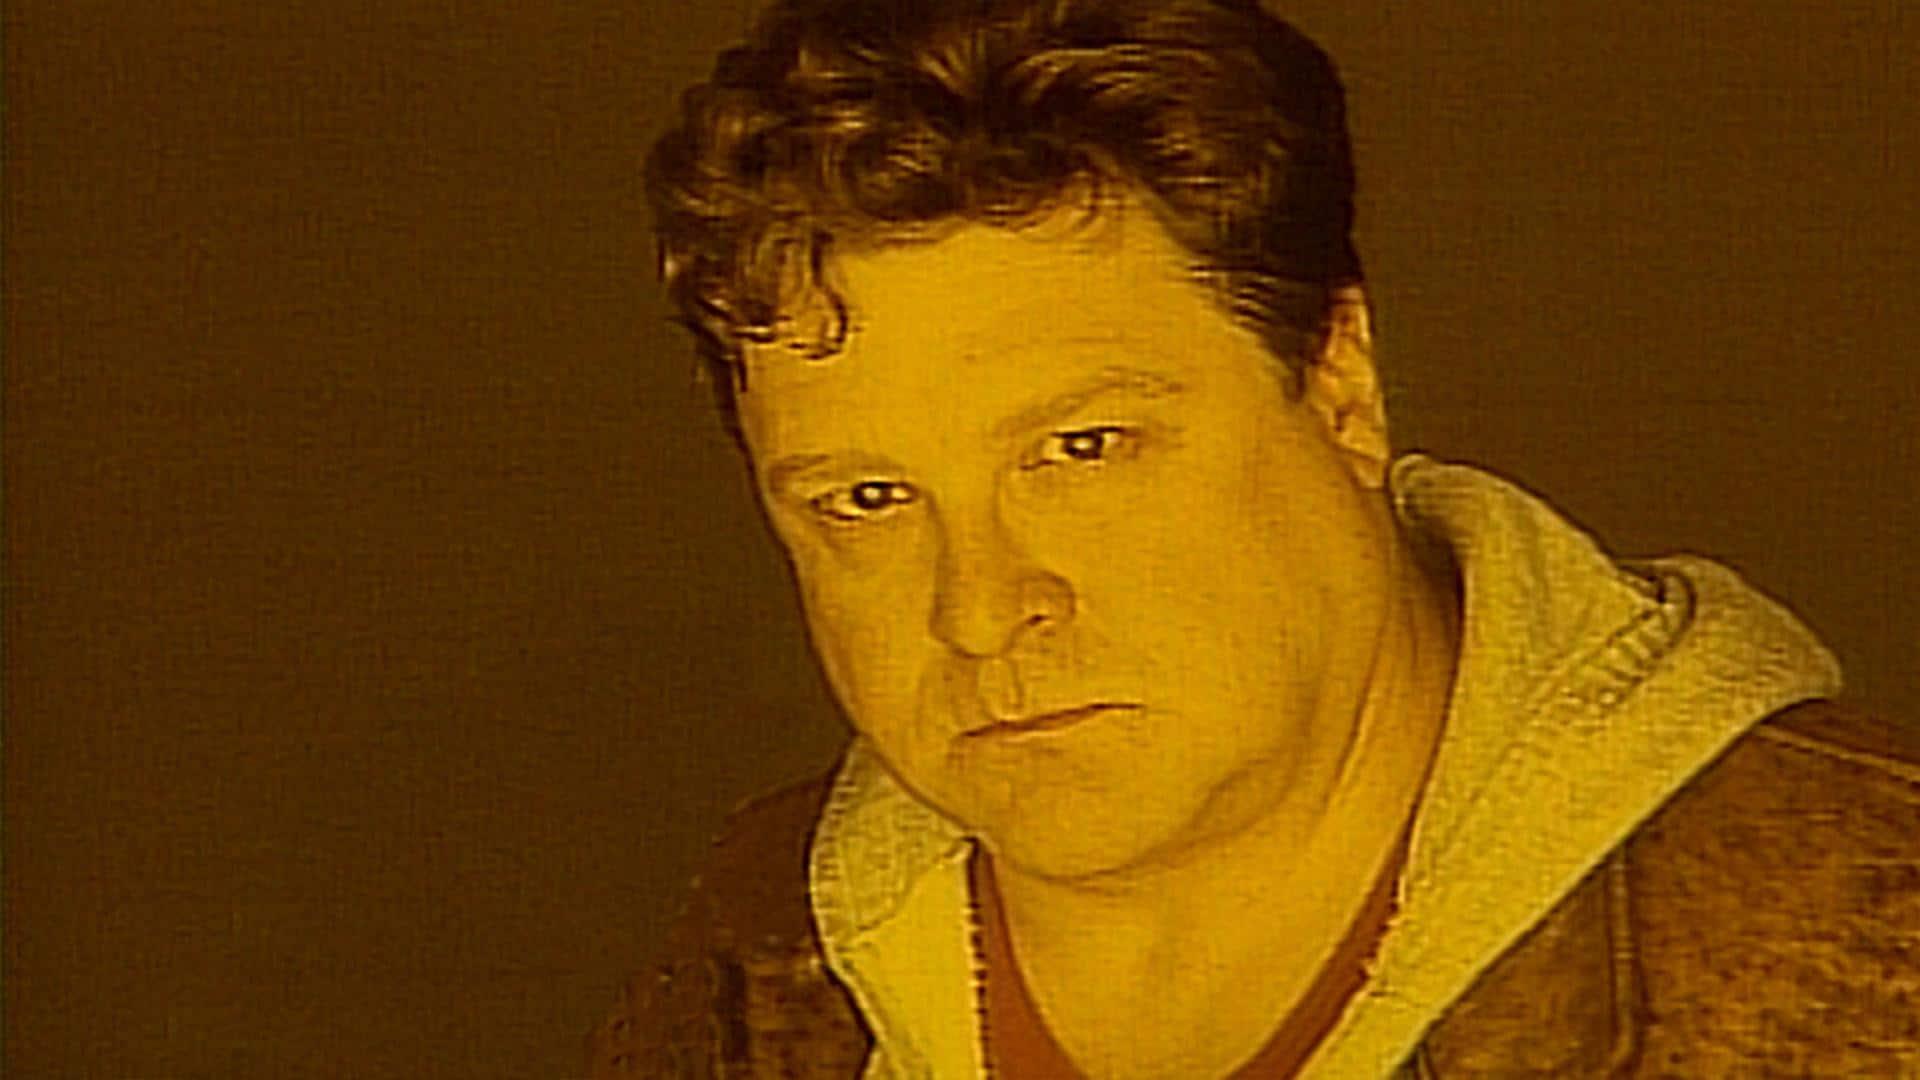 John Goodman: December 1, 1990